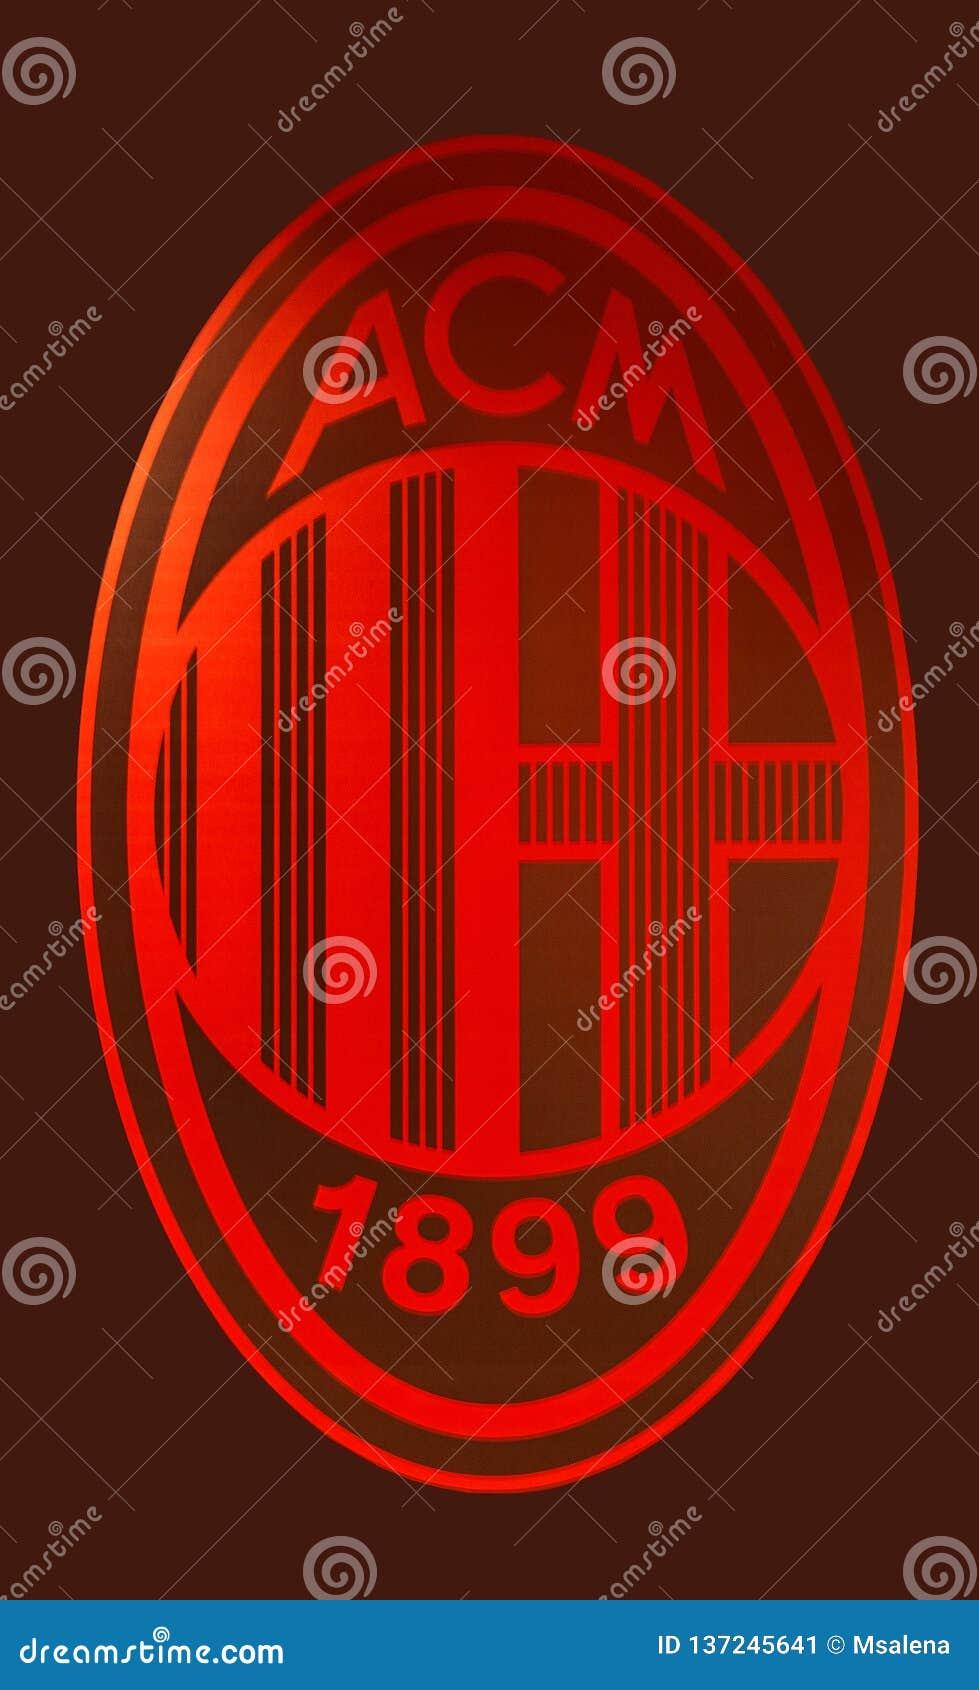 Милан футбол эмблема клуба